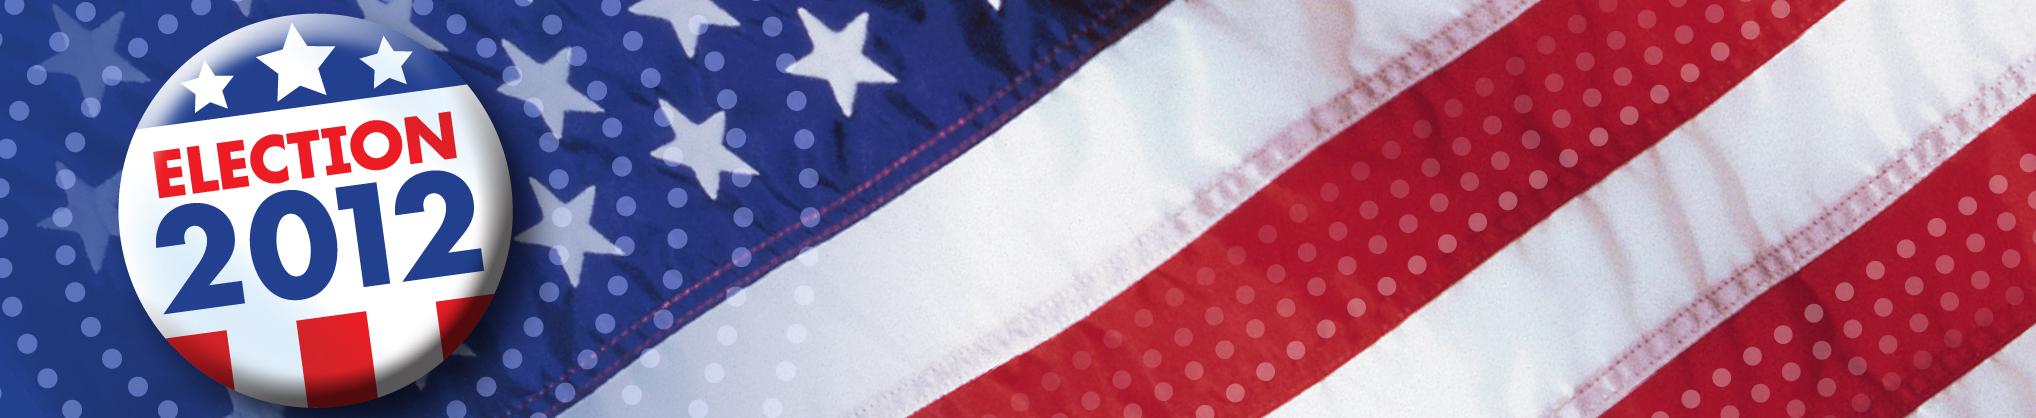 election-2012_banner.jpg